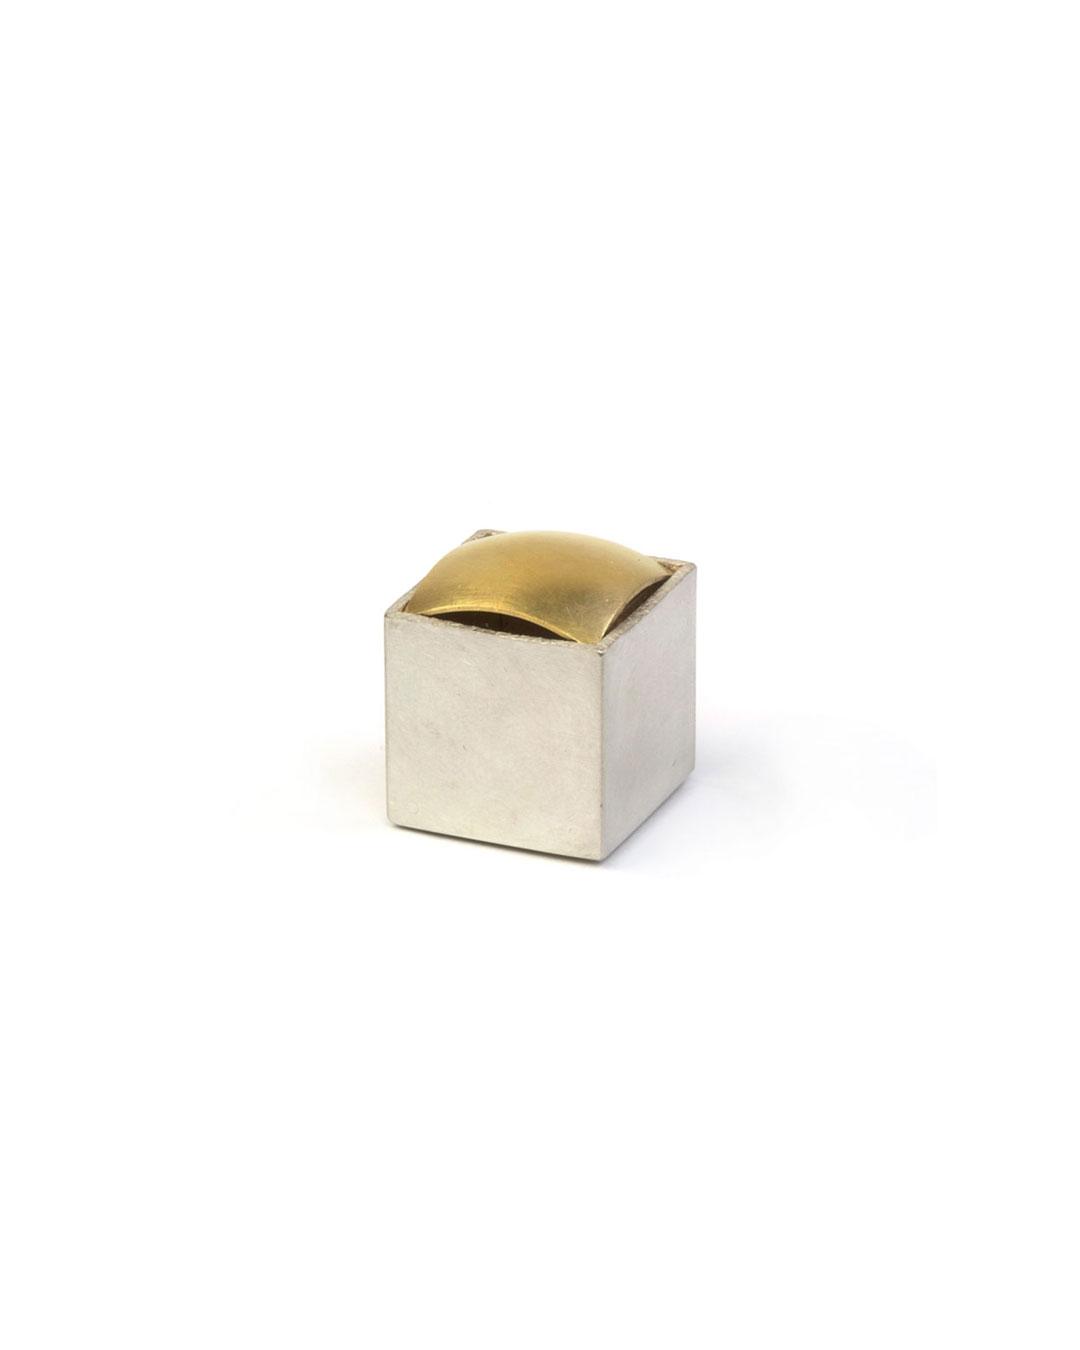 Okinari Kurokawa, untitled, 2008, ring; 970 silver, 835 gold, 24 x 20 x 20 mm, €1700